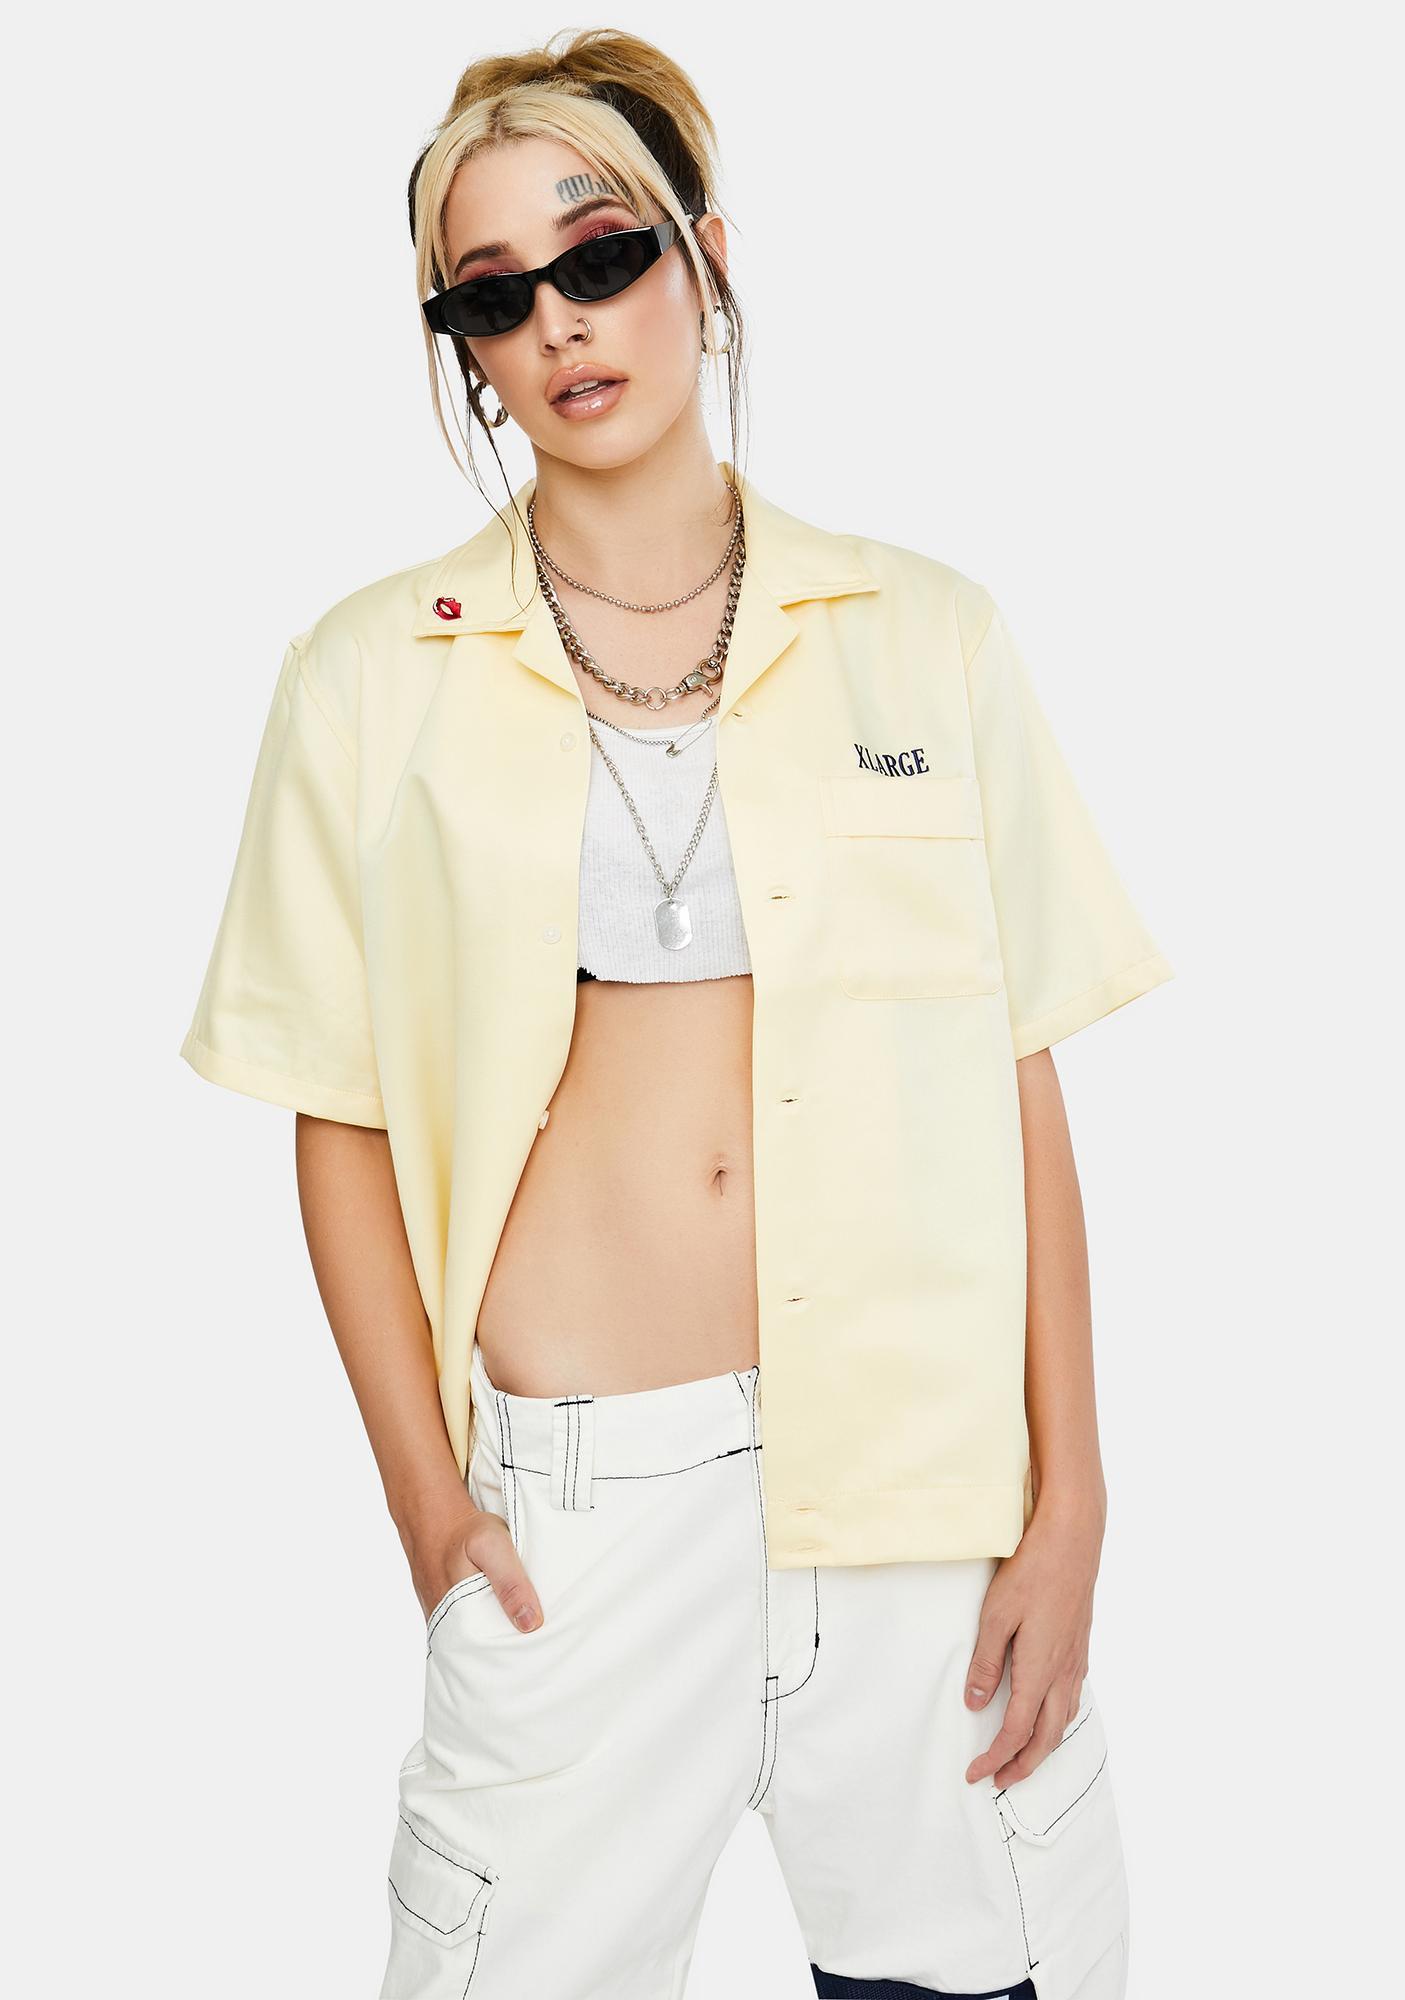 XLARGE Open Collar Casino Shirt